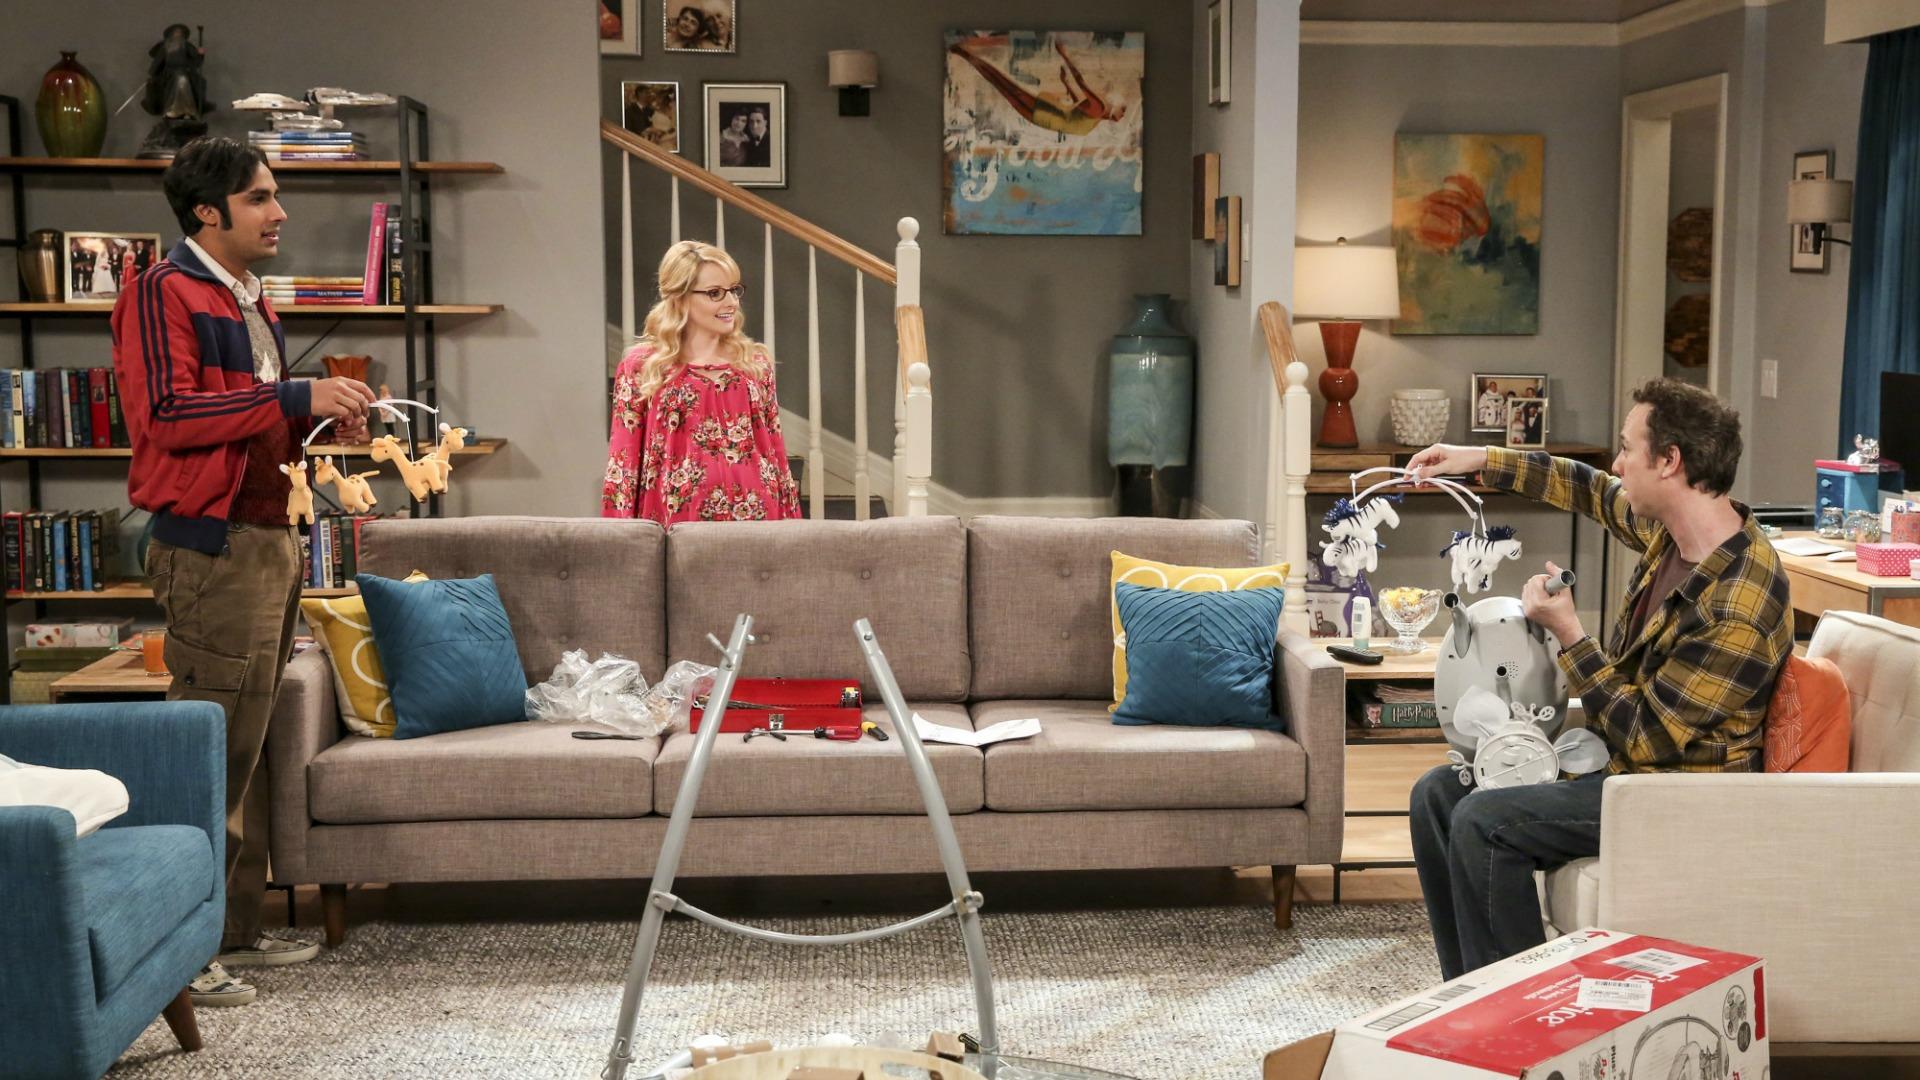 Raj and Stuart compete to impress Bernadette.